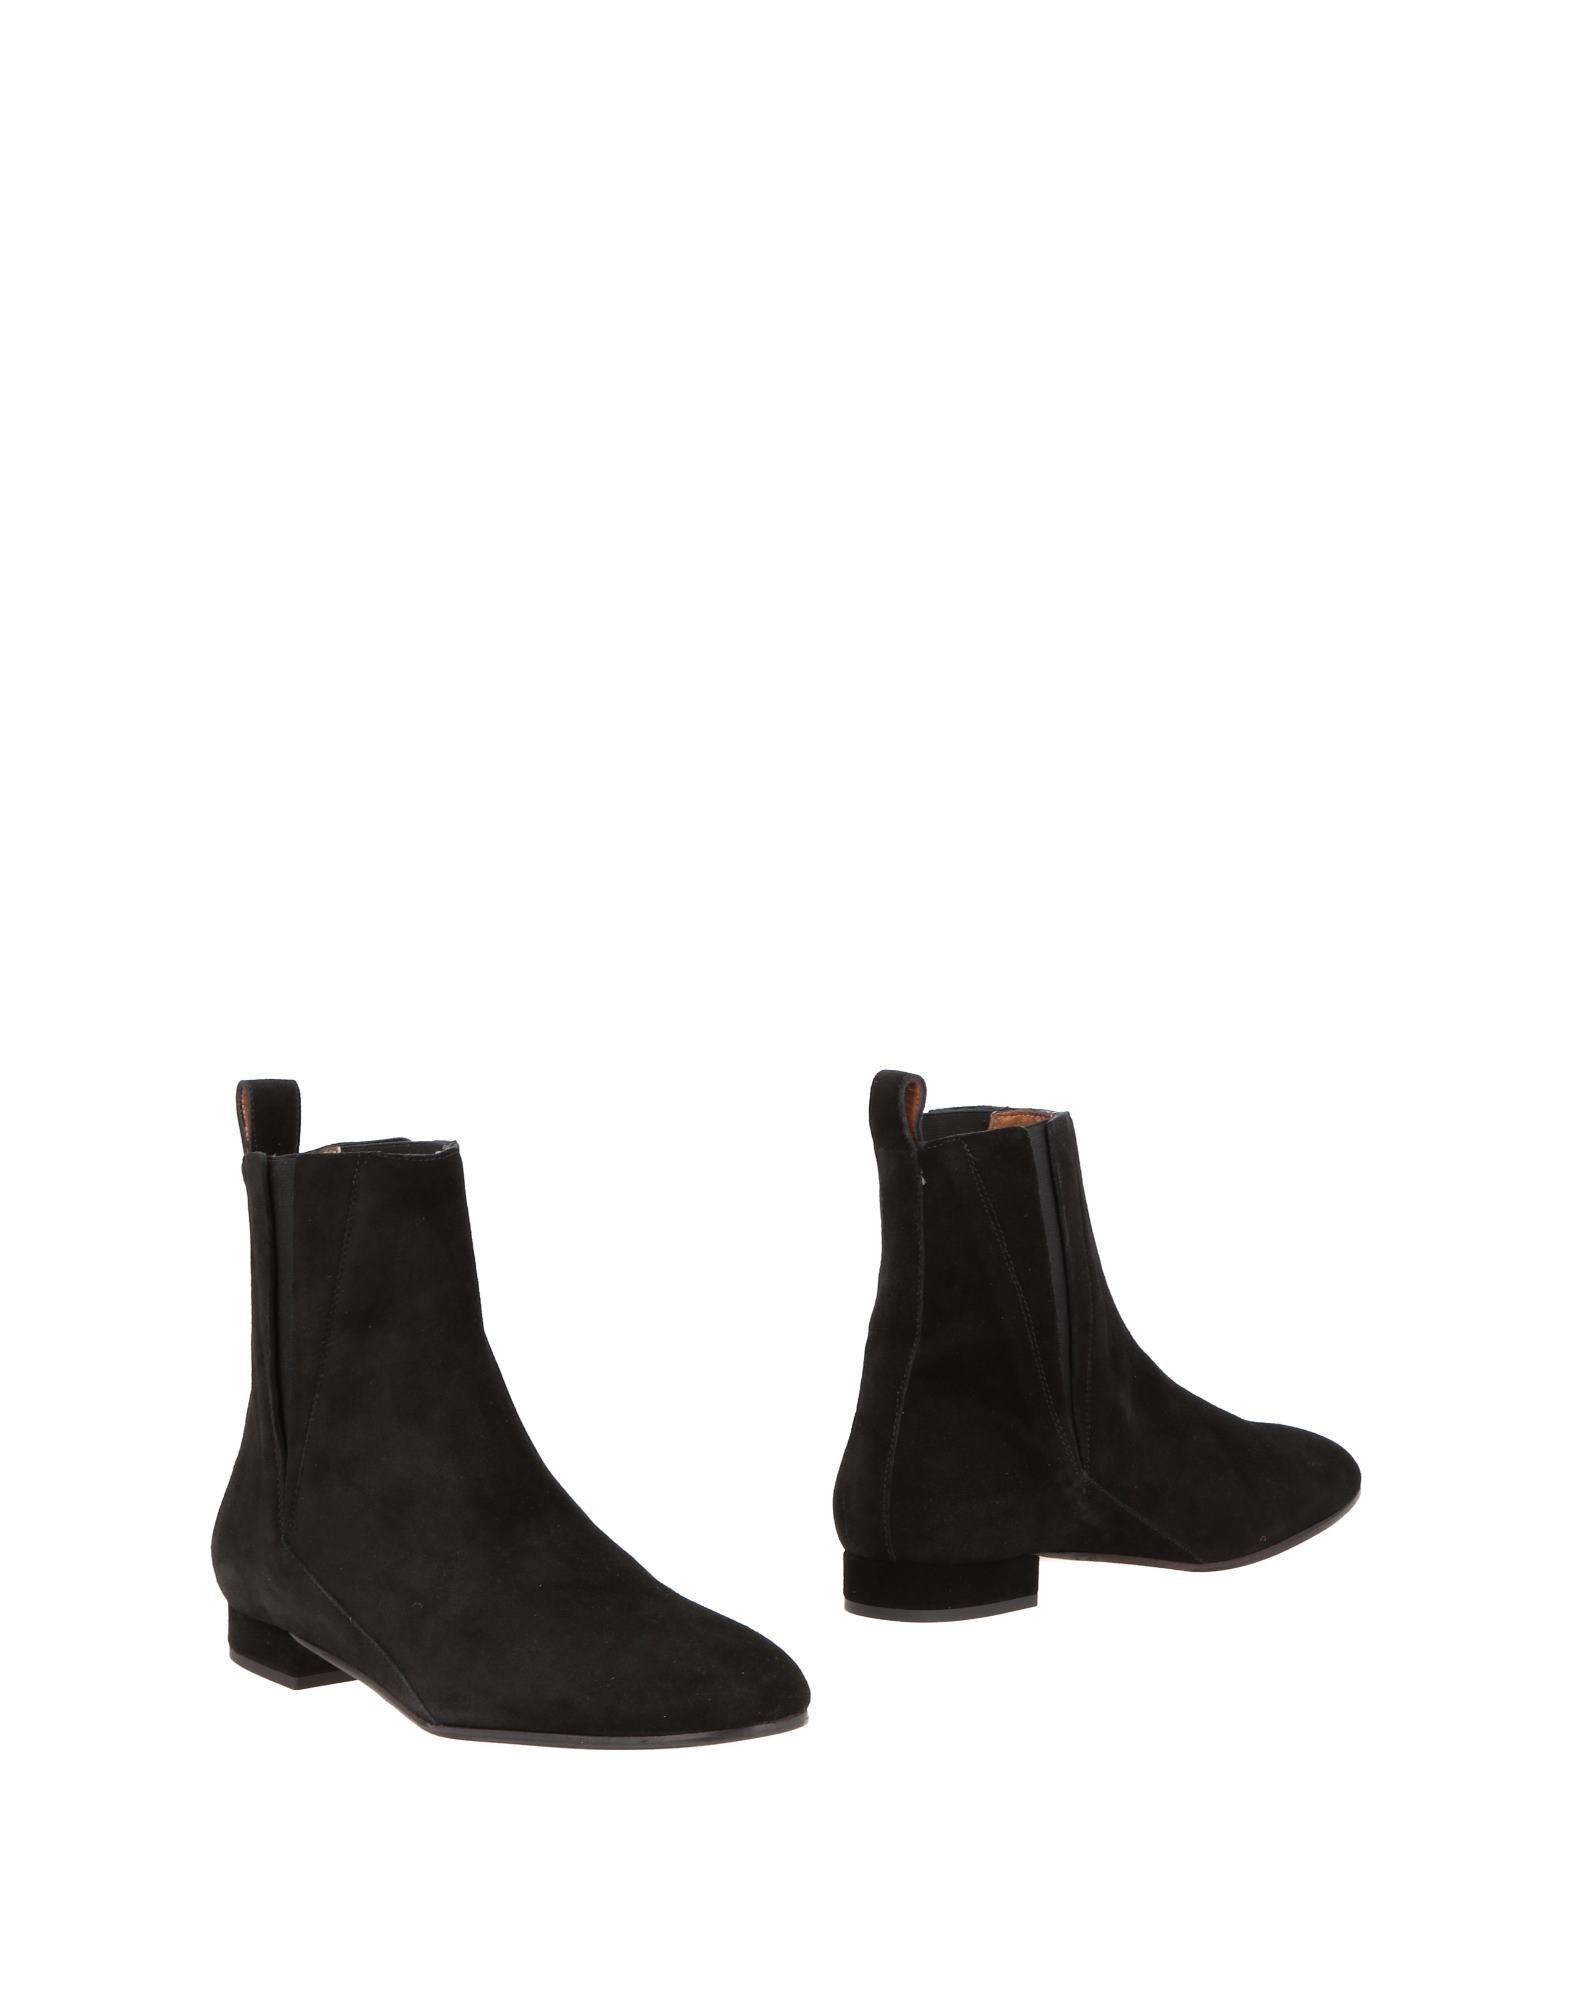 Atp Atelier Chelsea Boots Damen  11496311CSGut aussehende strapazierfähige Schuhe